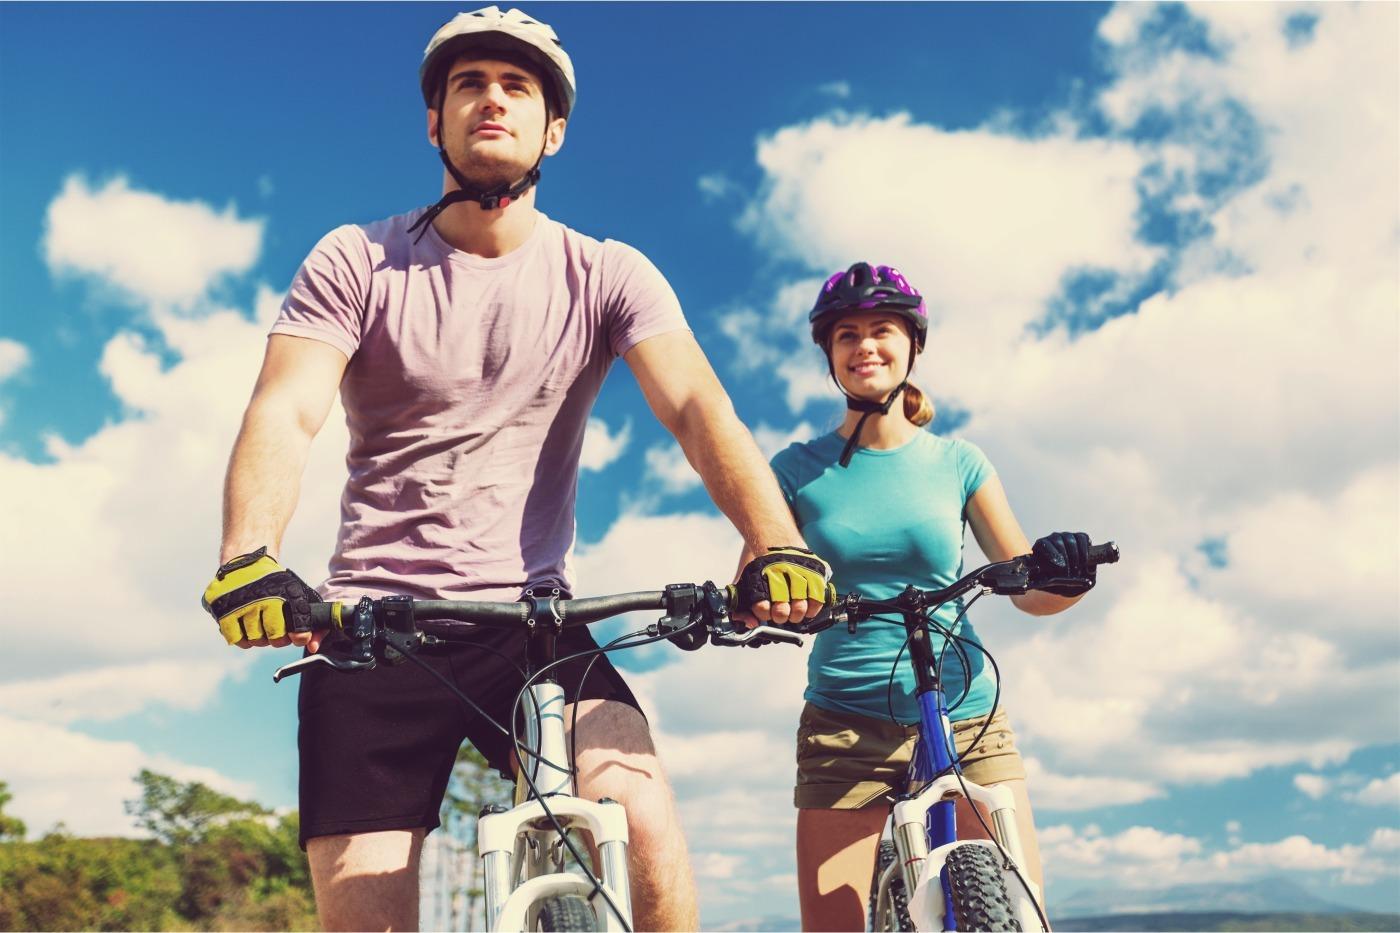 Bike biking ride mountain cyclist woman helmet